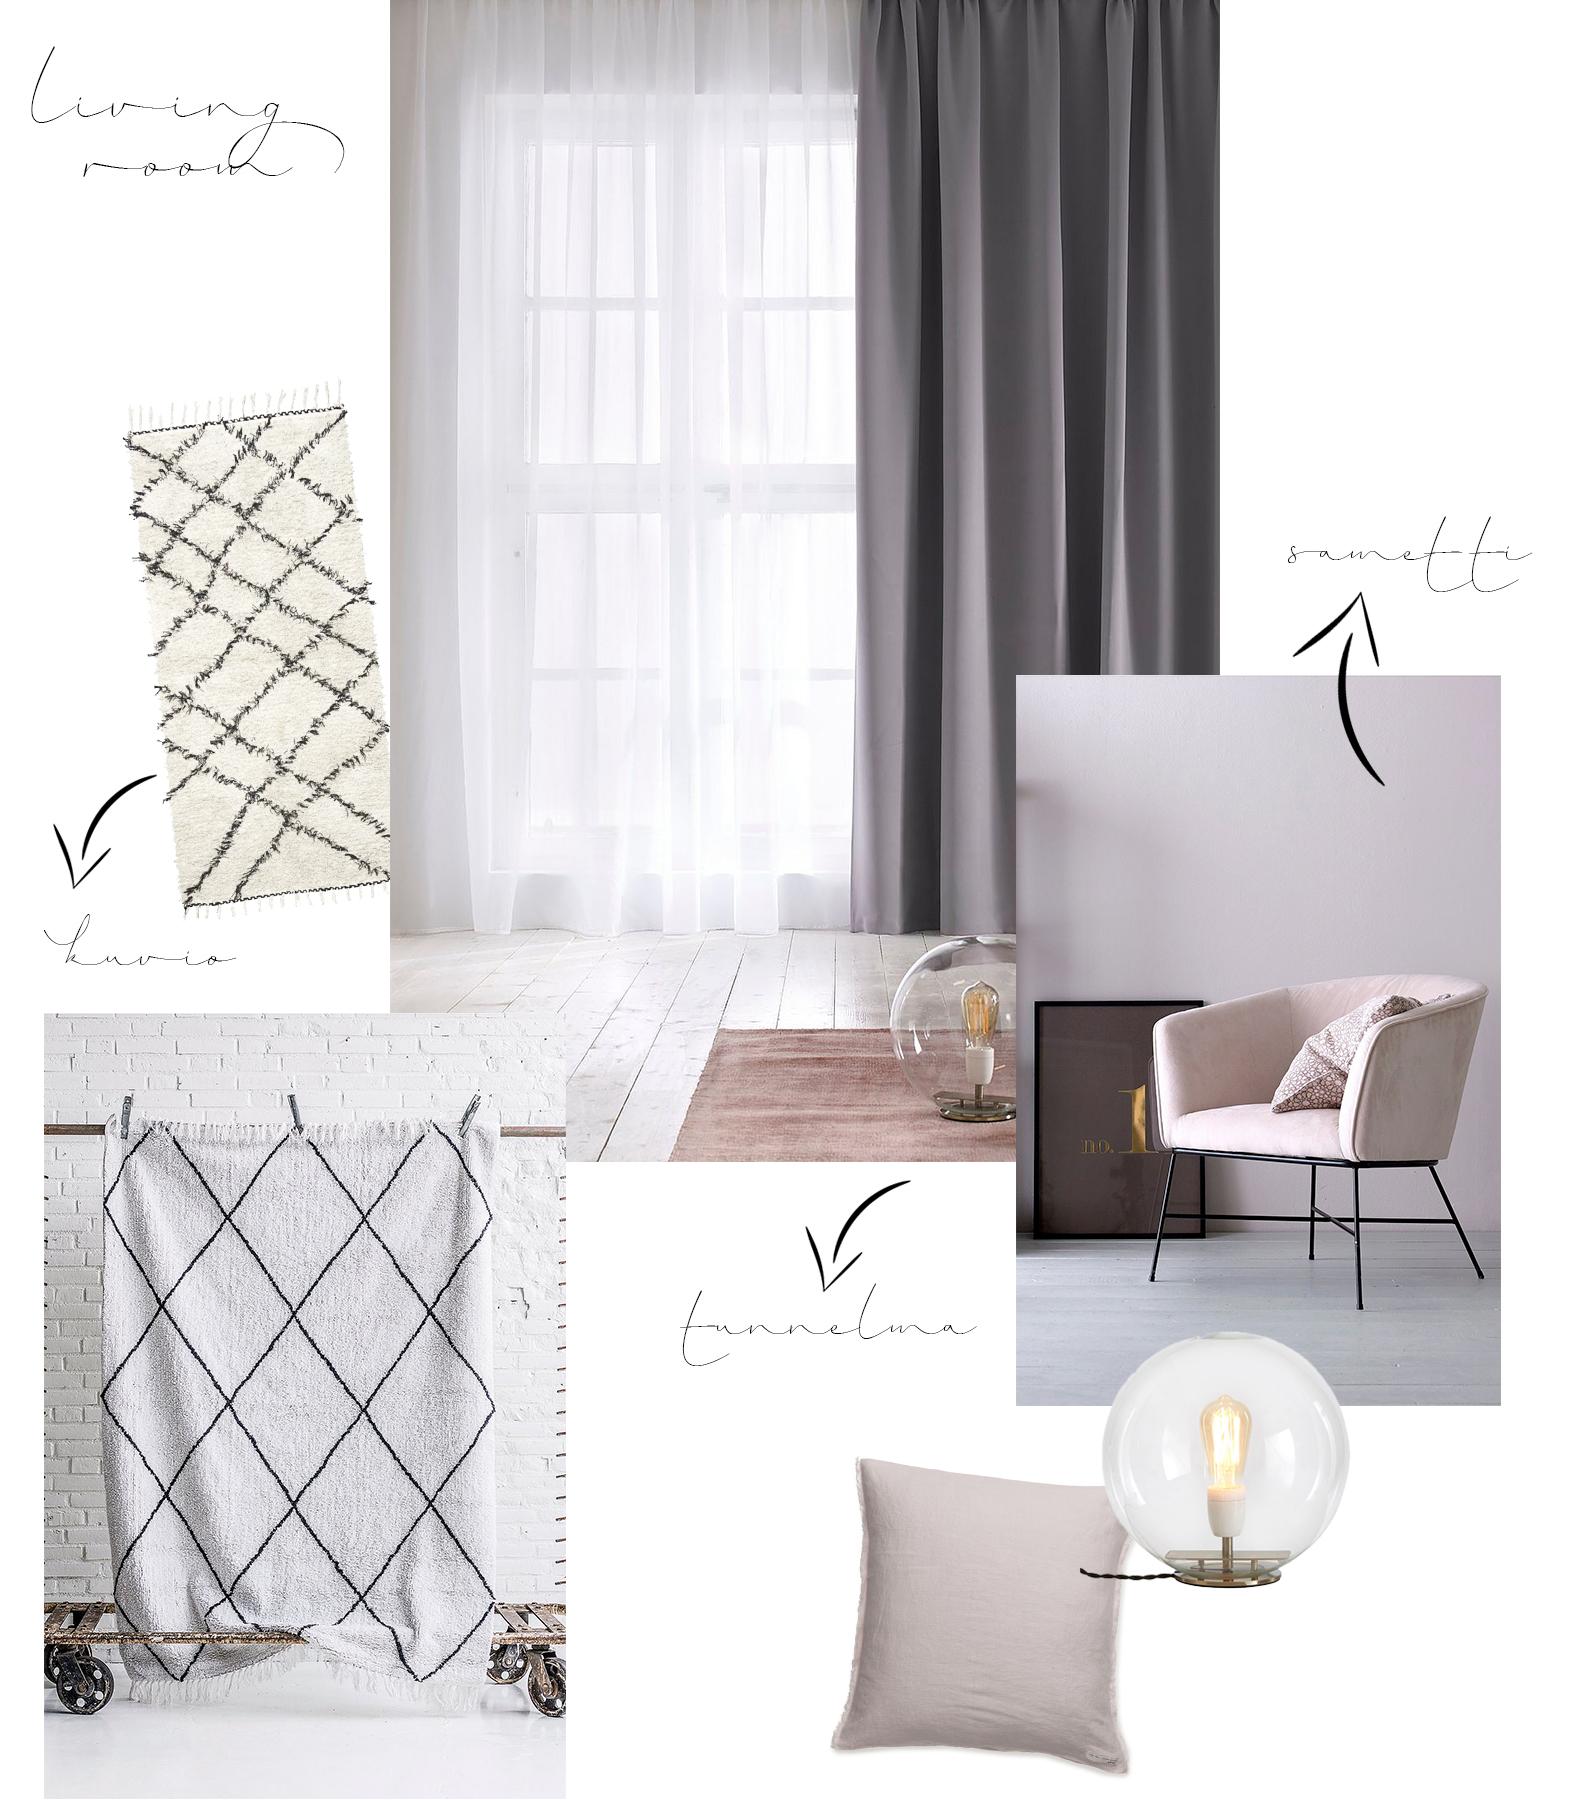 Char and the city, Olohuone / Living room, sisustus / interior, sale pics from Ellos, Room21, Jotex